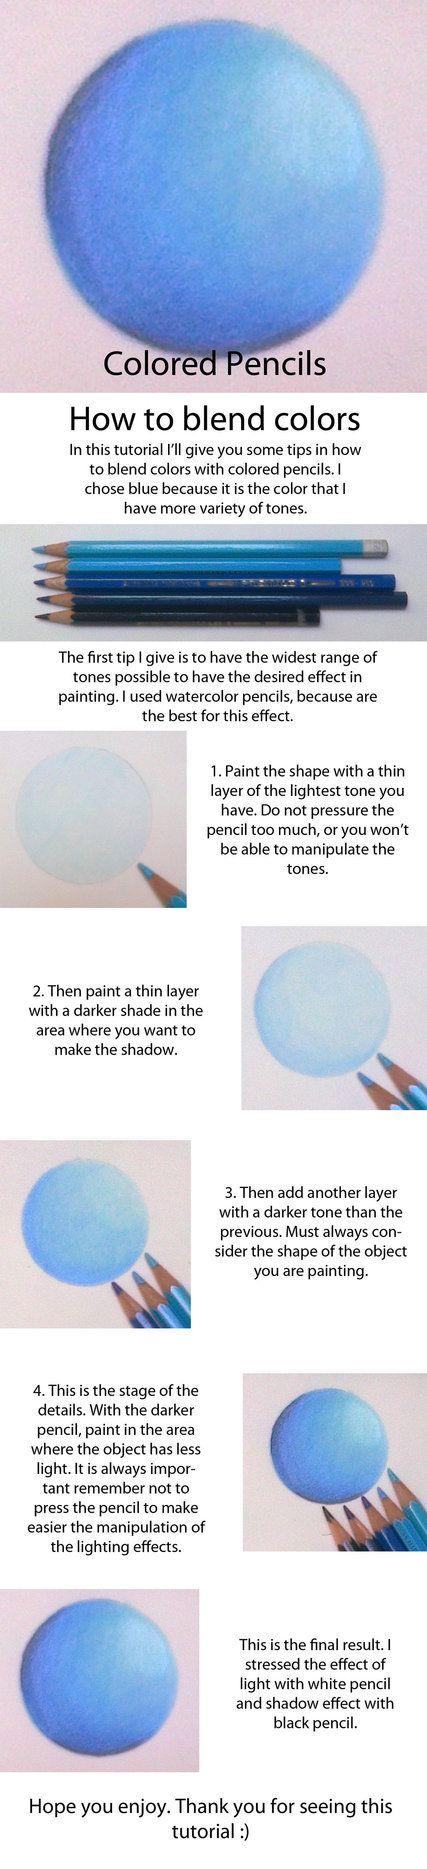 Colored Pencils - Blending Tutorial